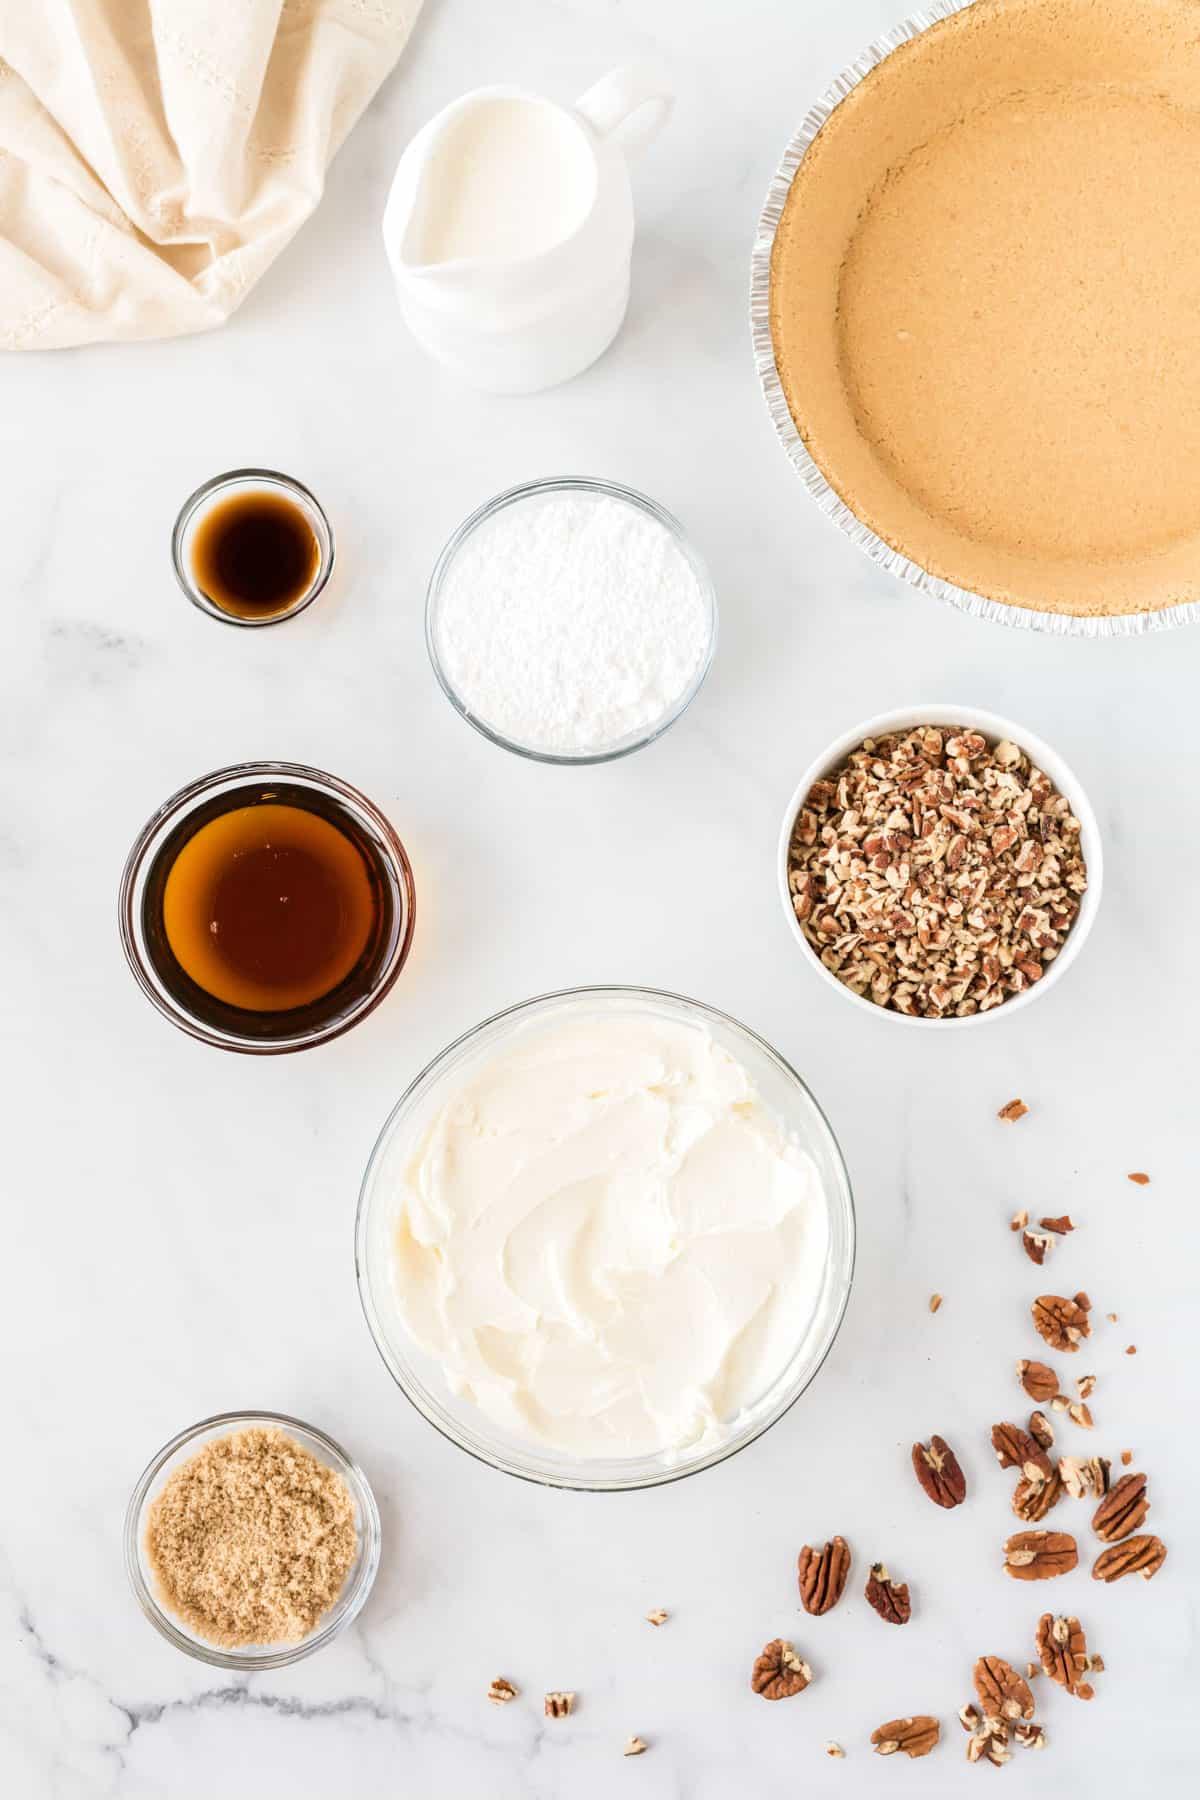 pecan cream pie ingredients from an overhead view